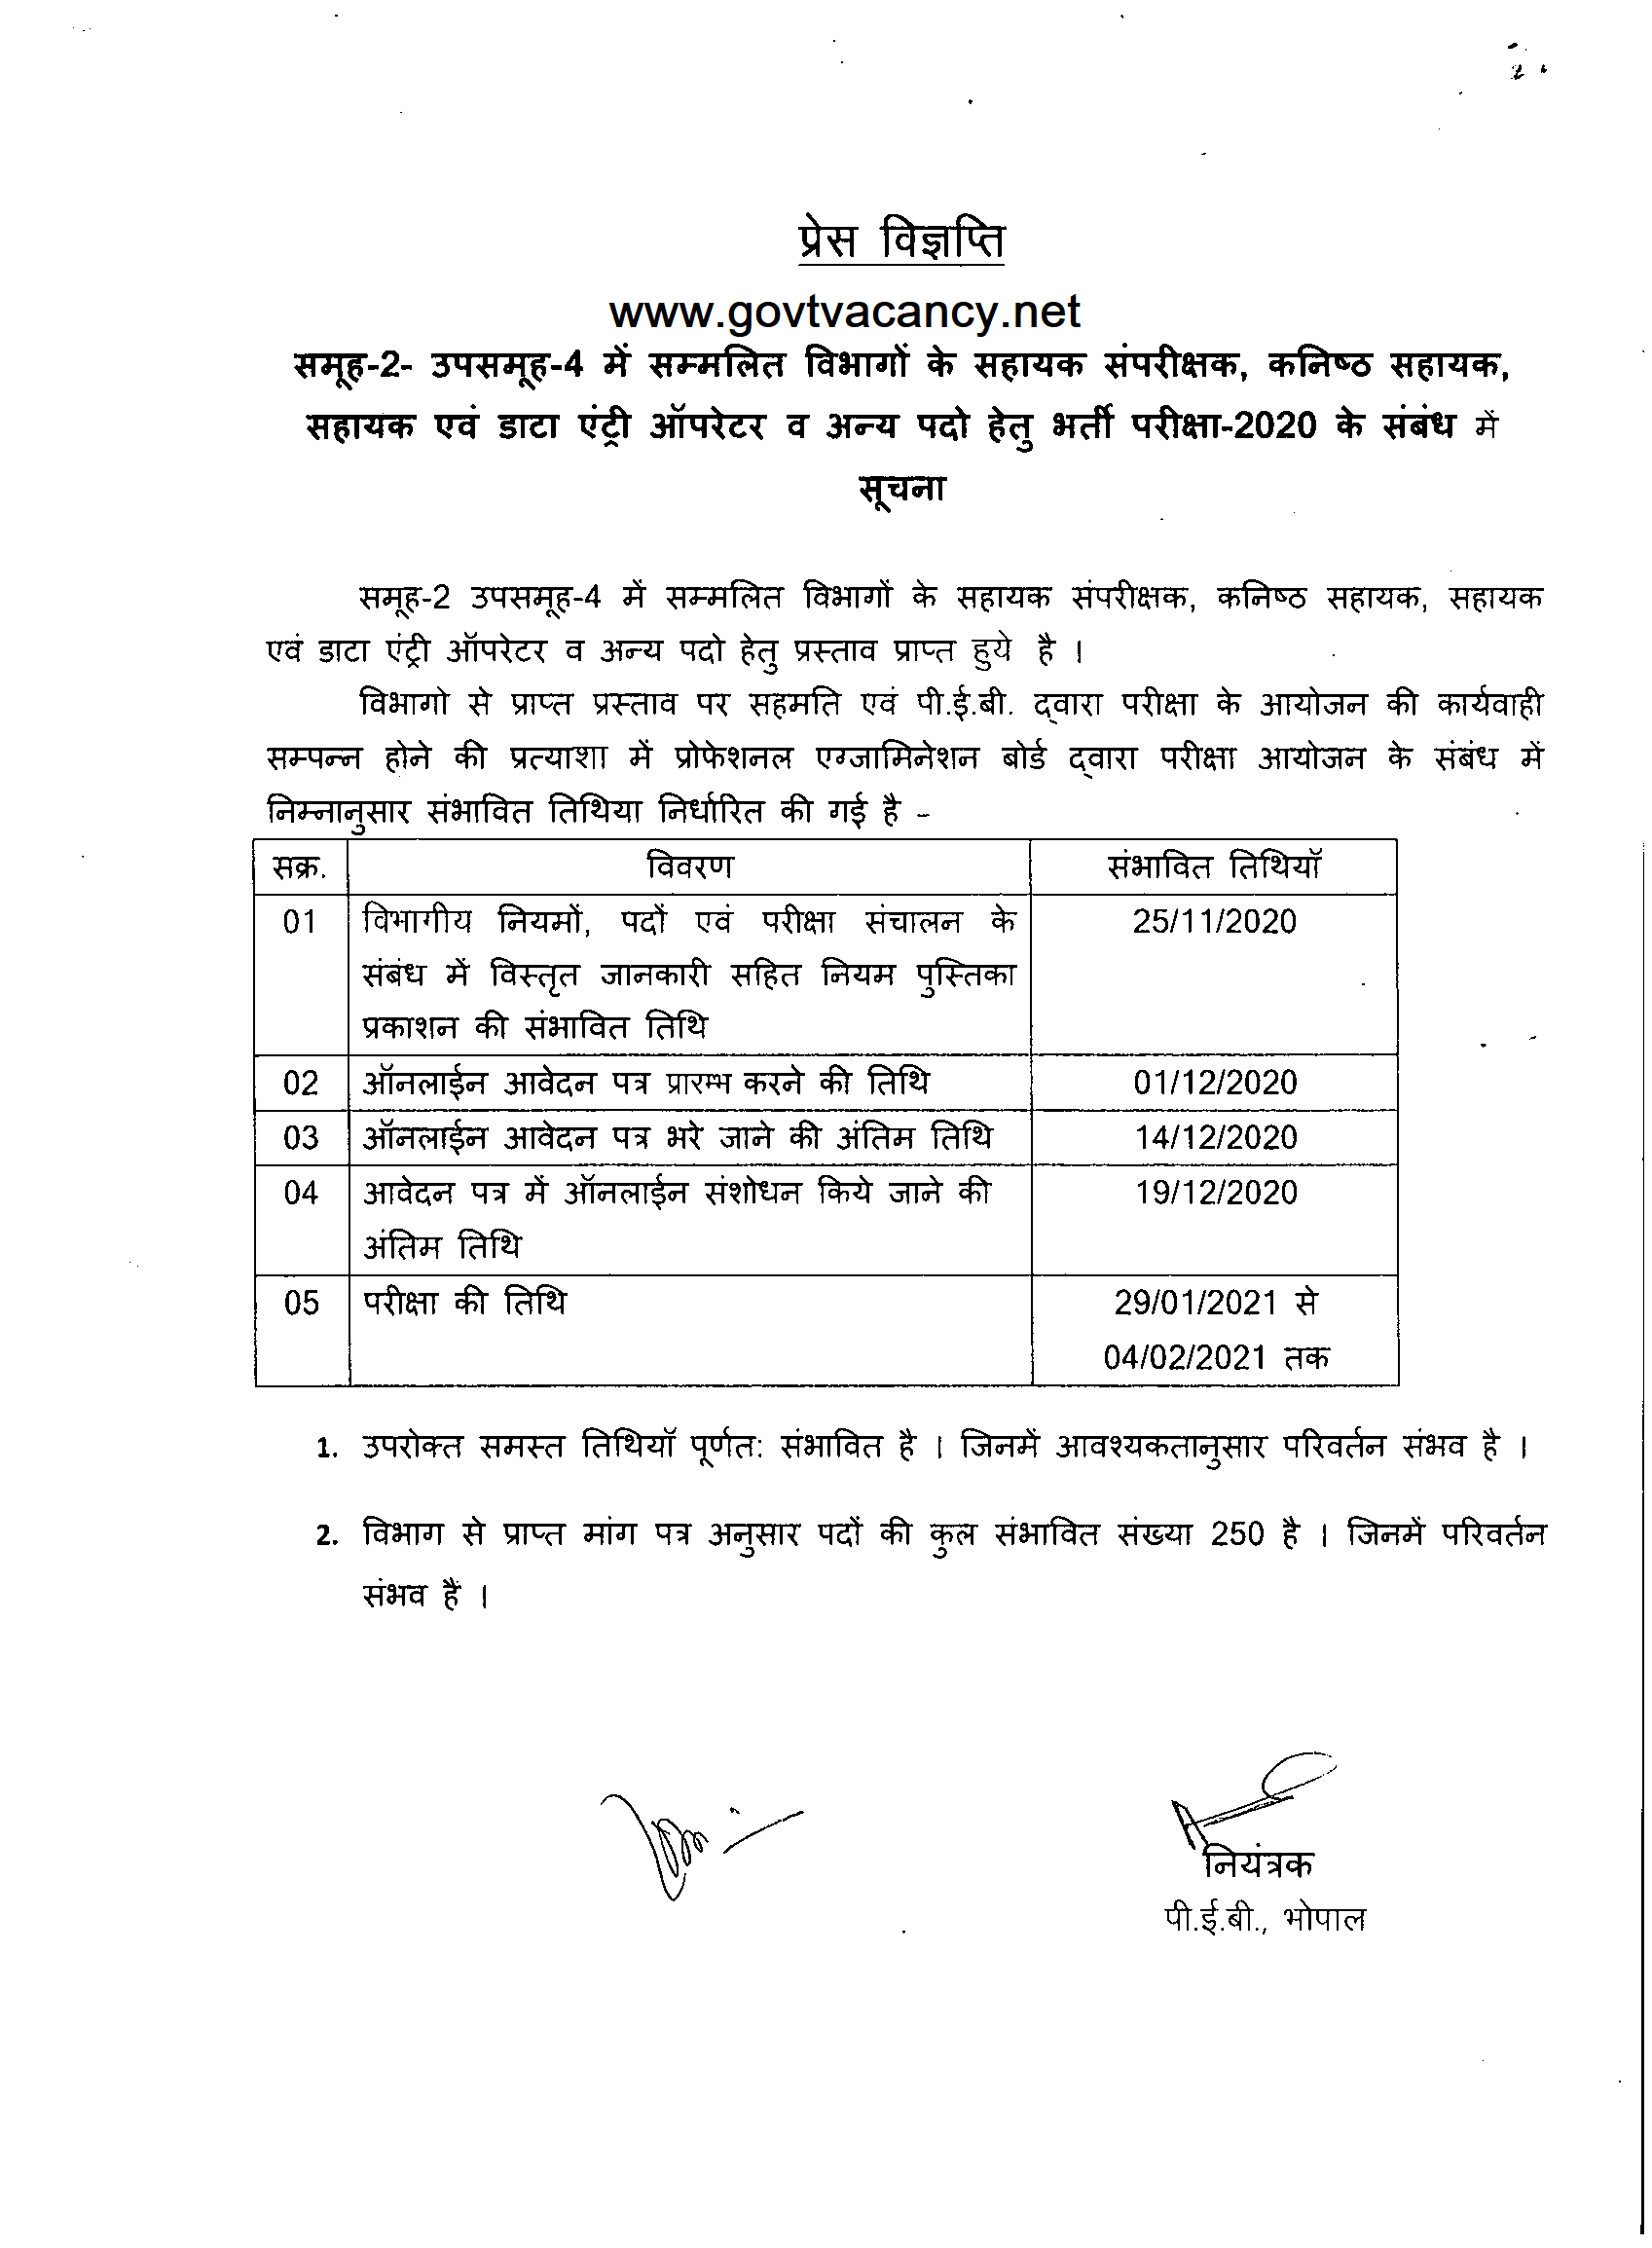 Latest govt vacancy in mp, 12th pass govt job in madhya pradesh, data entry job for 12th pass, 12th pass job in madhya pradesh, latest data entry govt vacancy in madhya pradesh, mp govt job.